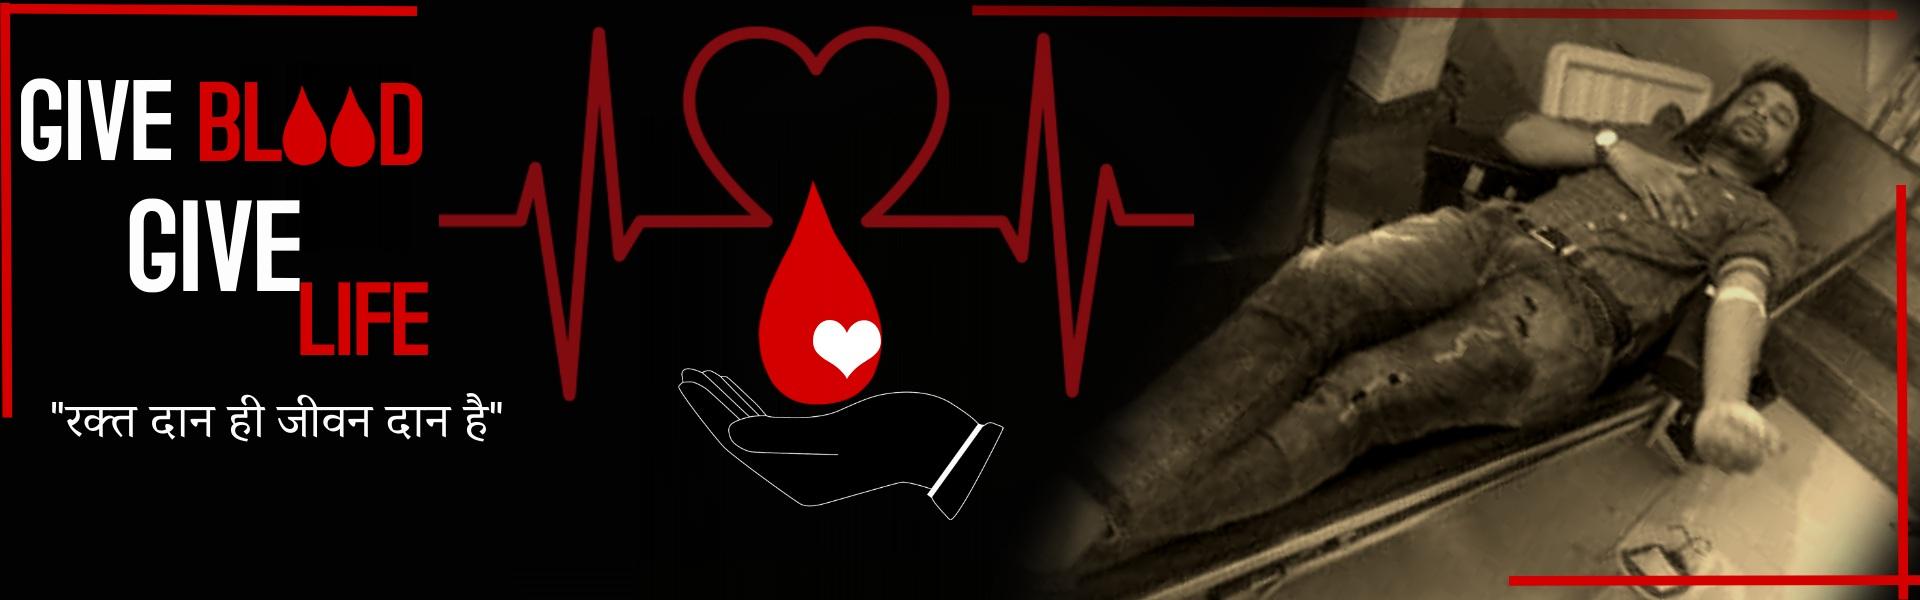 blood donation banner